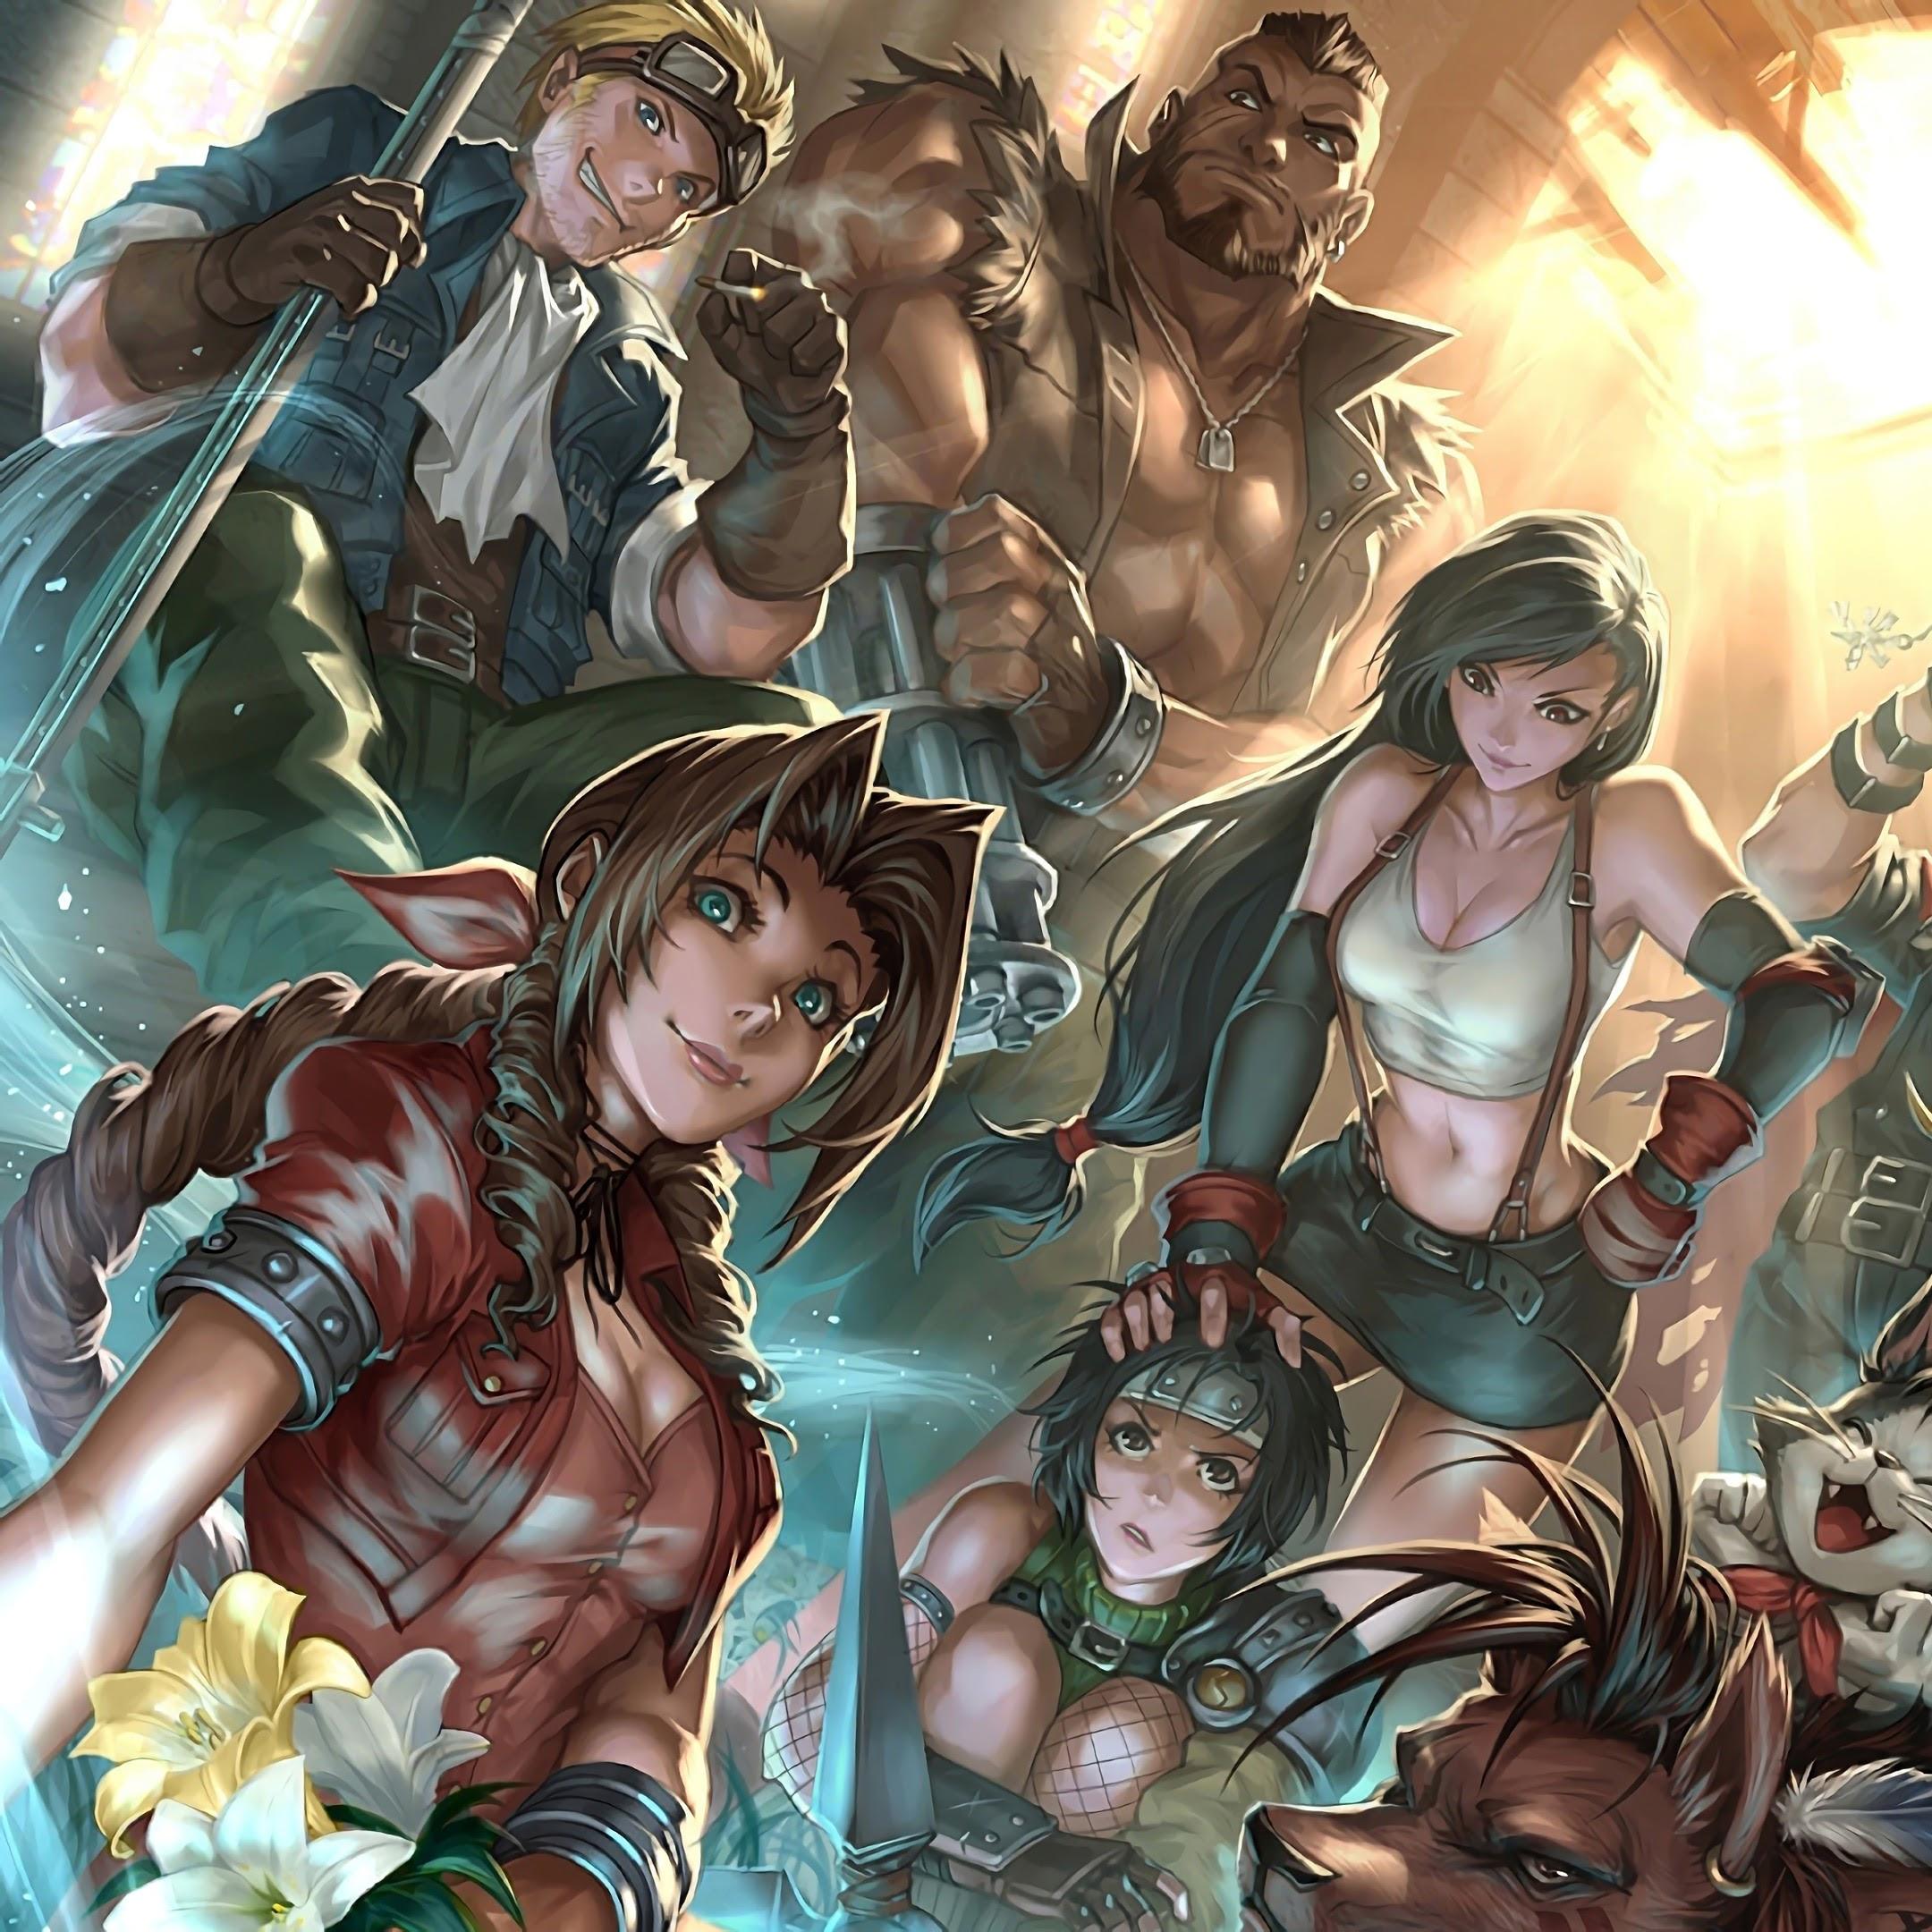 Final Fantasy 7 Remake, Characters, 4K, #40 Wallpaper